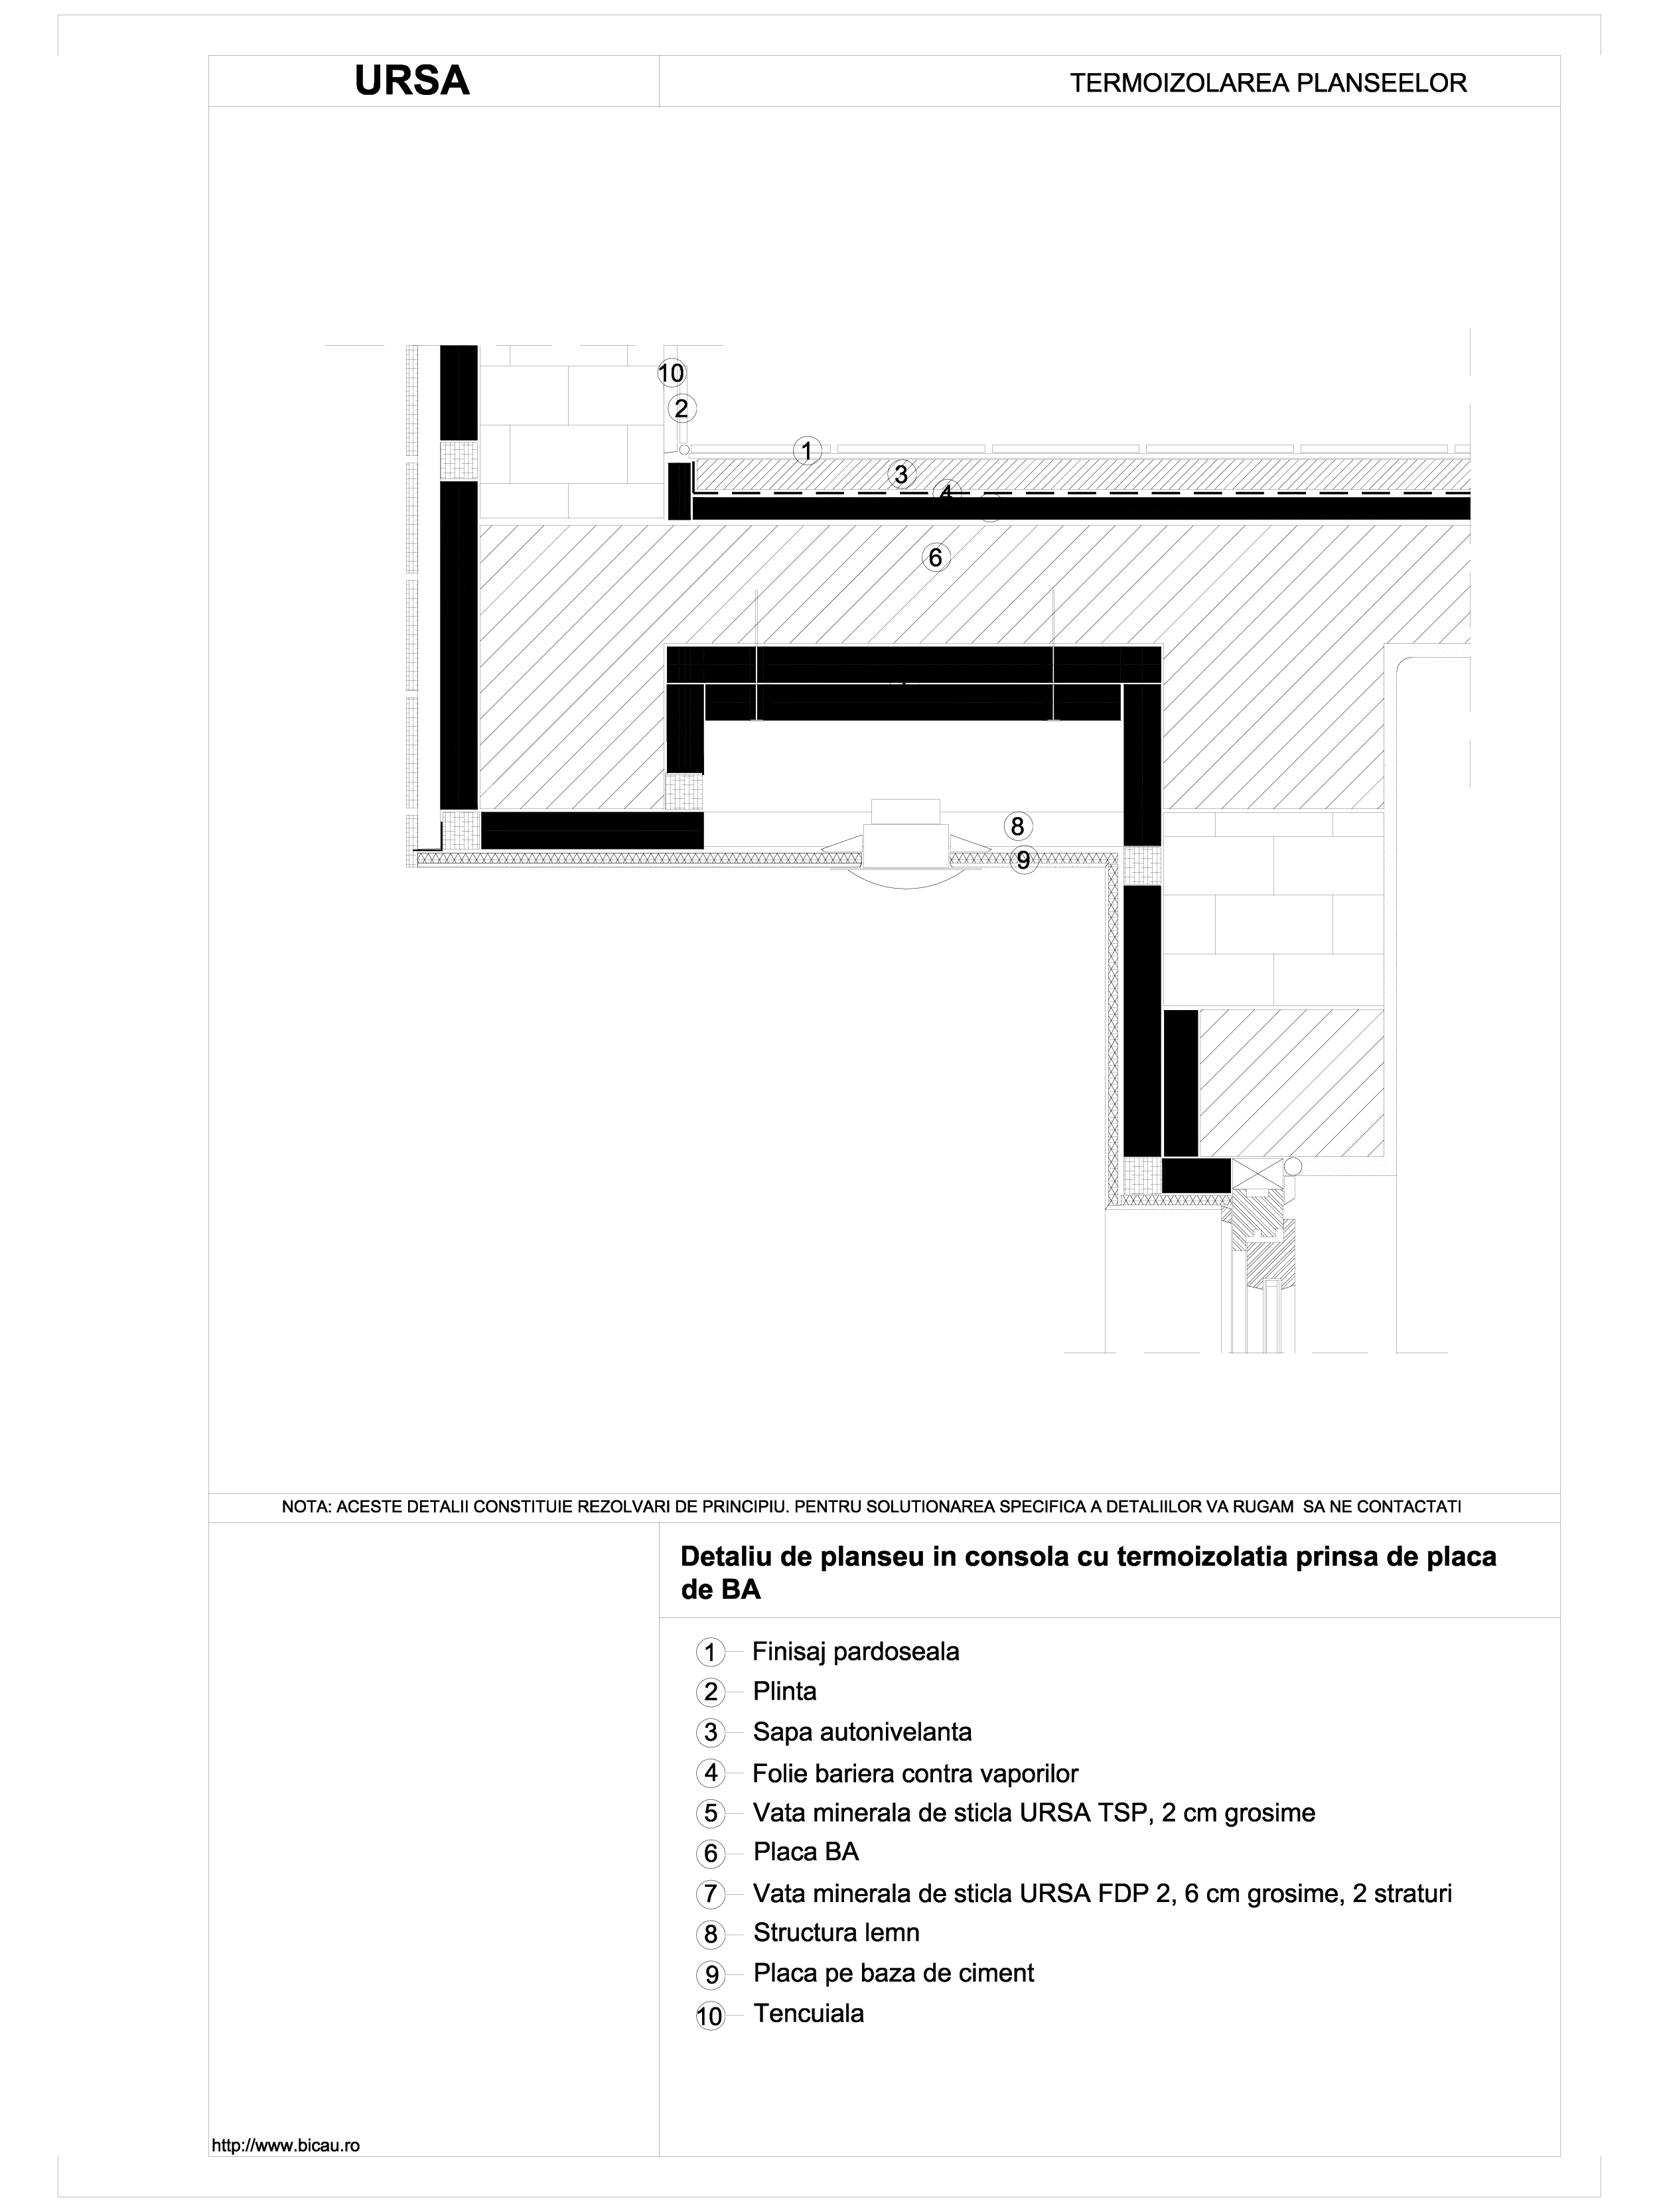 Detaliu de planseu in consola cu termoizolatia prinsa de placa de BA TSP URSA Vata minerala pentru pardoseli URSA ROMANIA   - Pagina 1